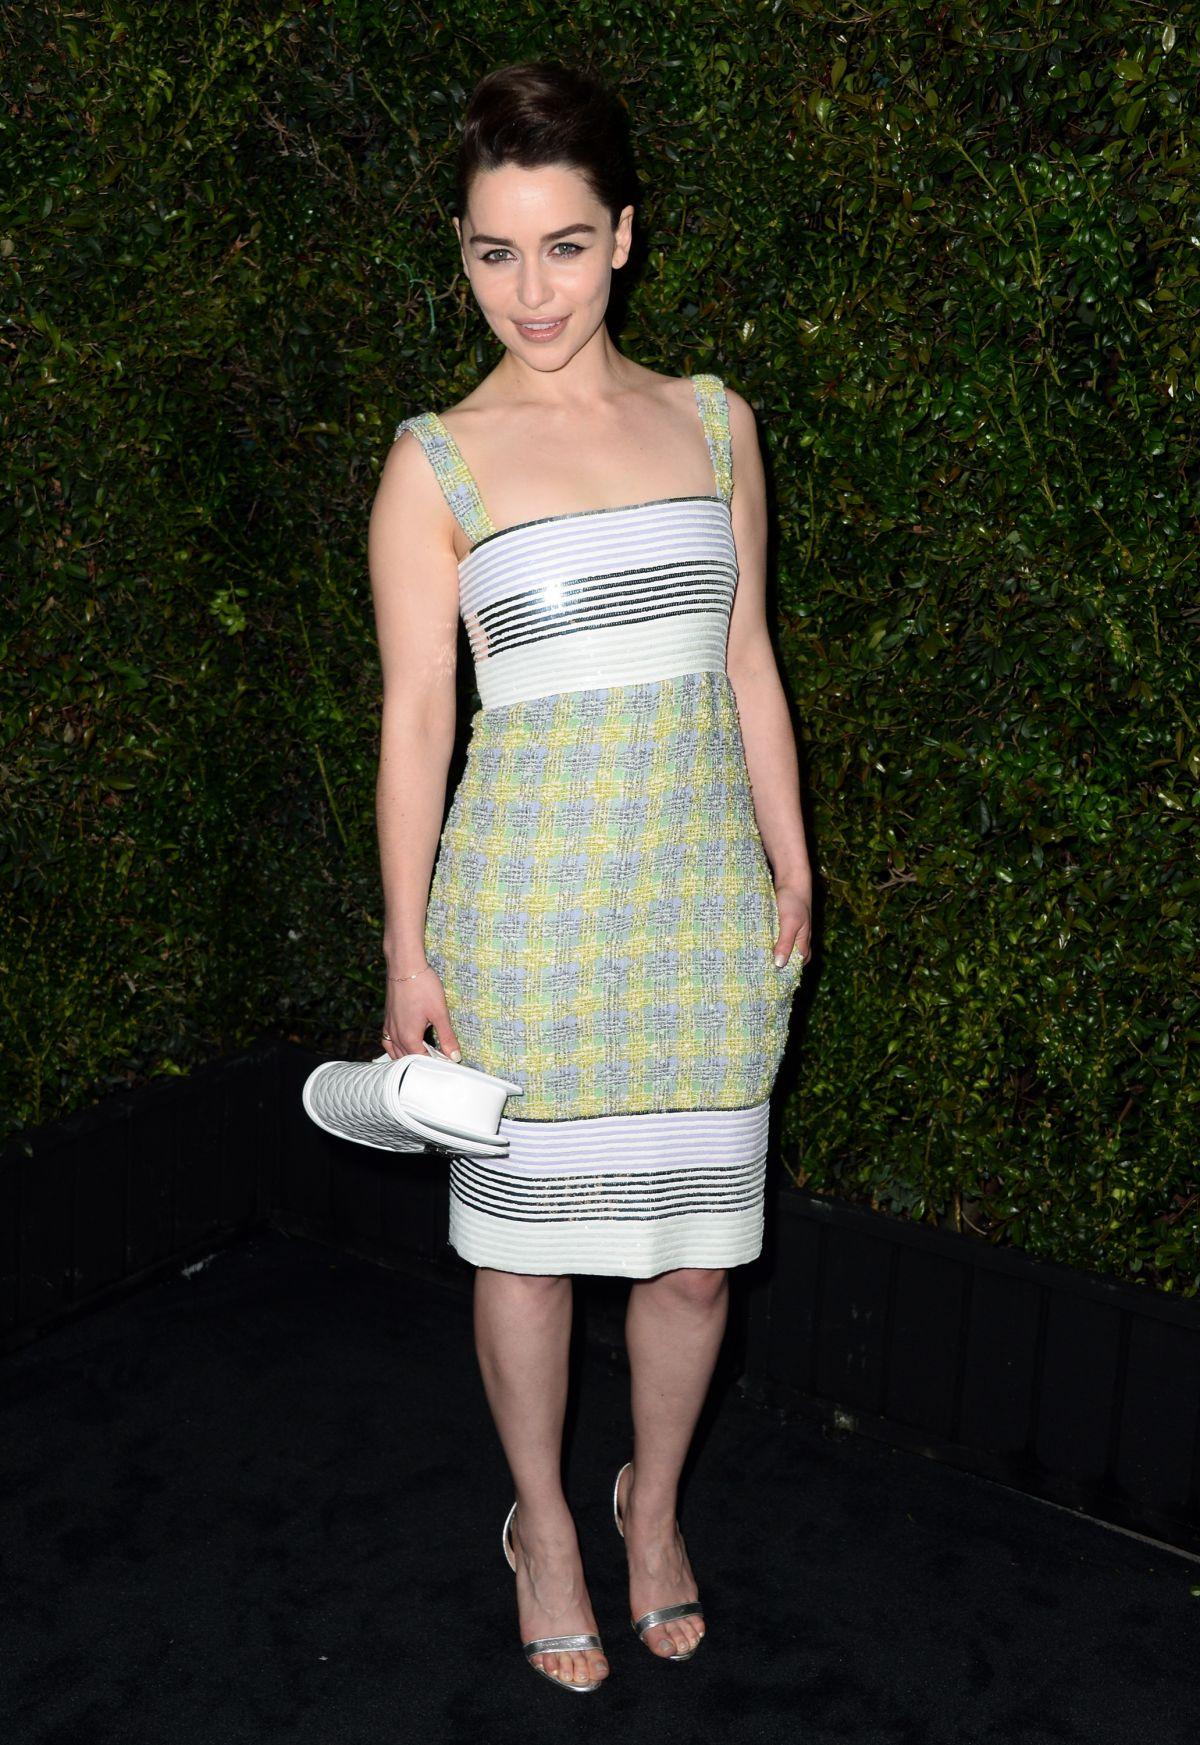 EMILIA CLARKE at Chanel Charles Finch Pre-Oscar Dinner in Los Angeles